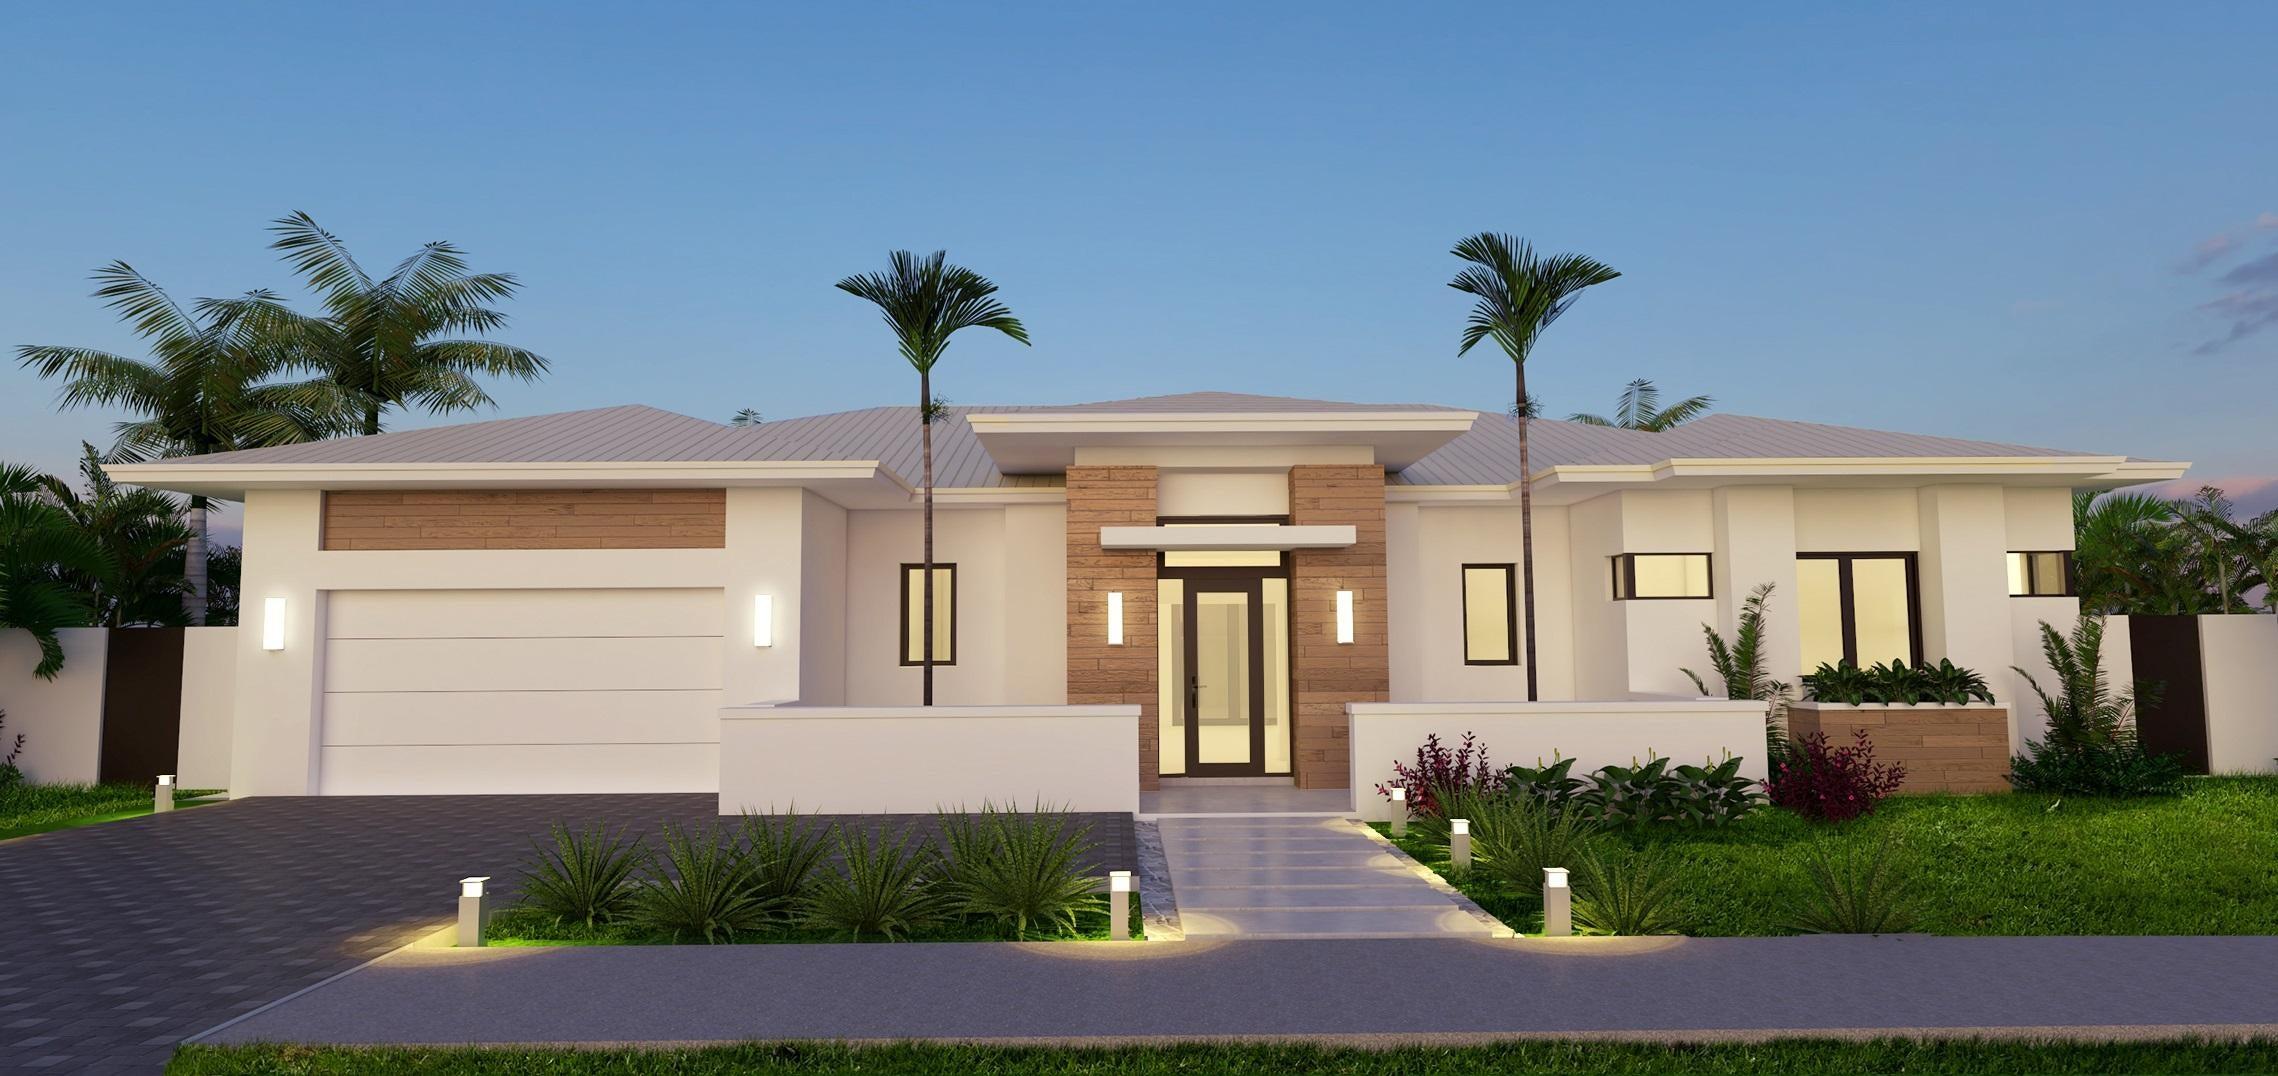 1 Coconut Road, Delray Beach, FL 33444